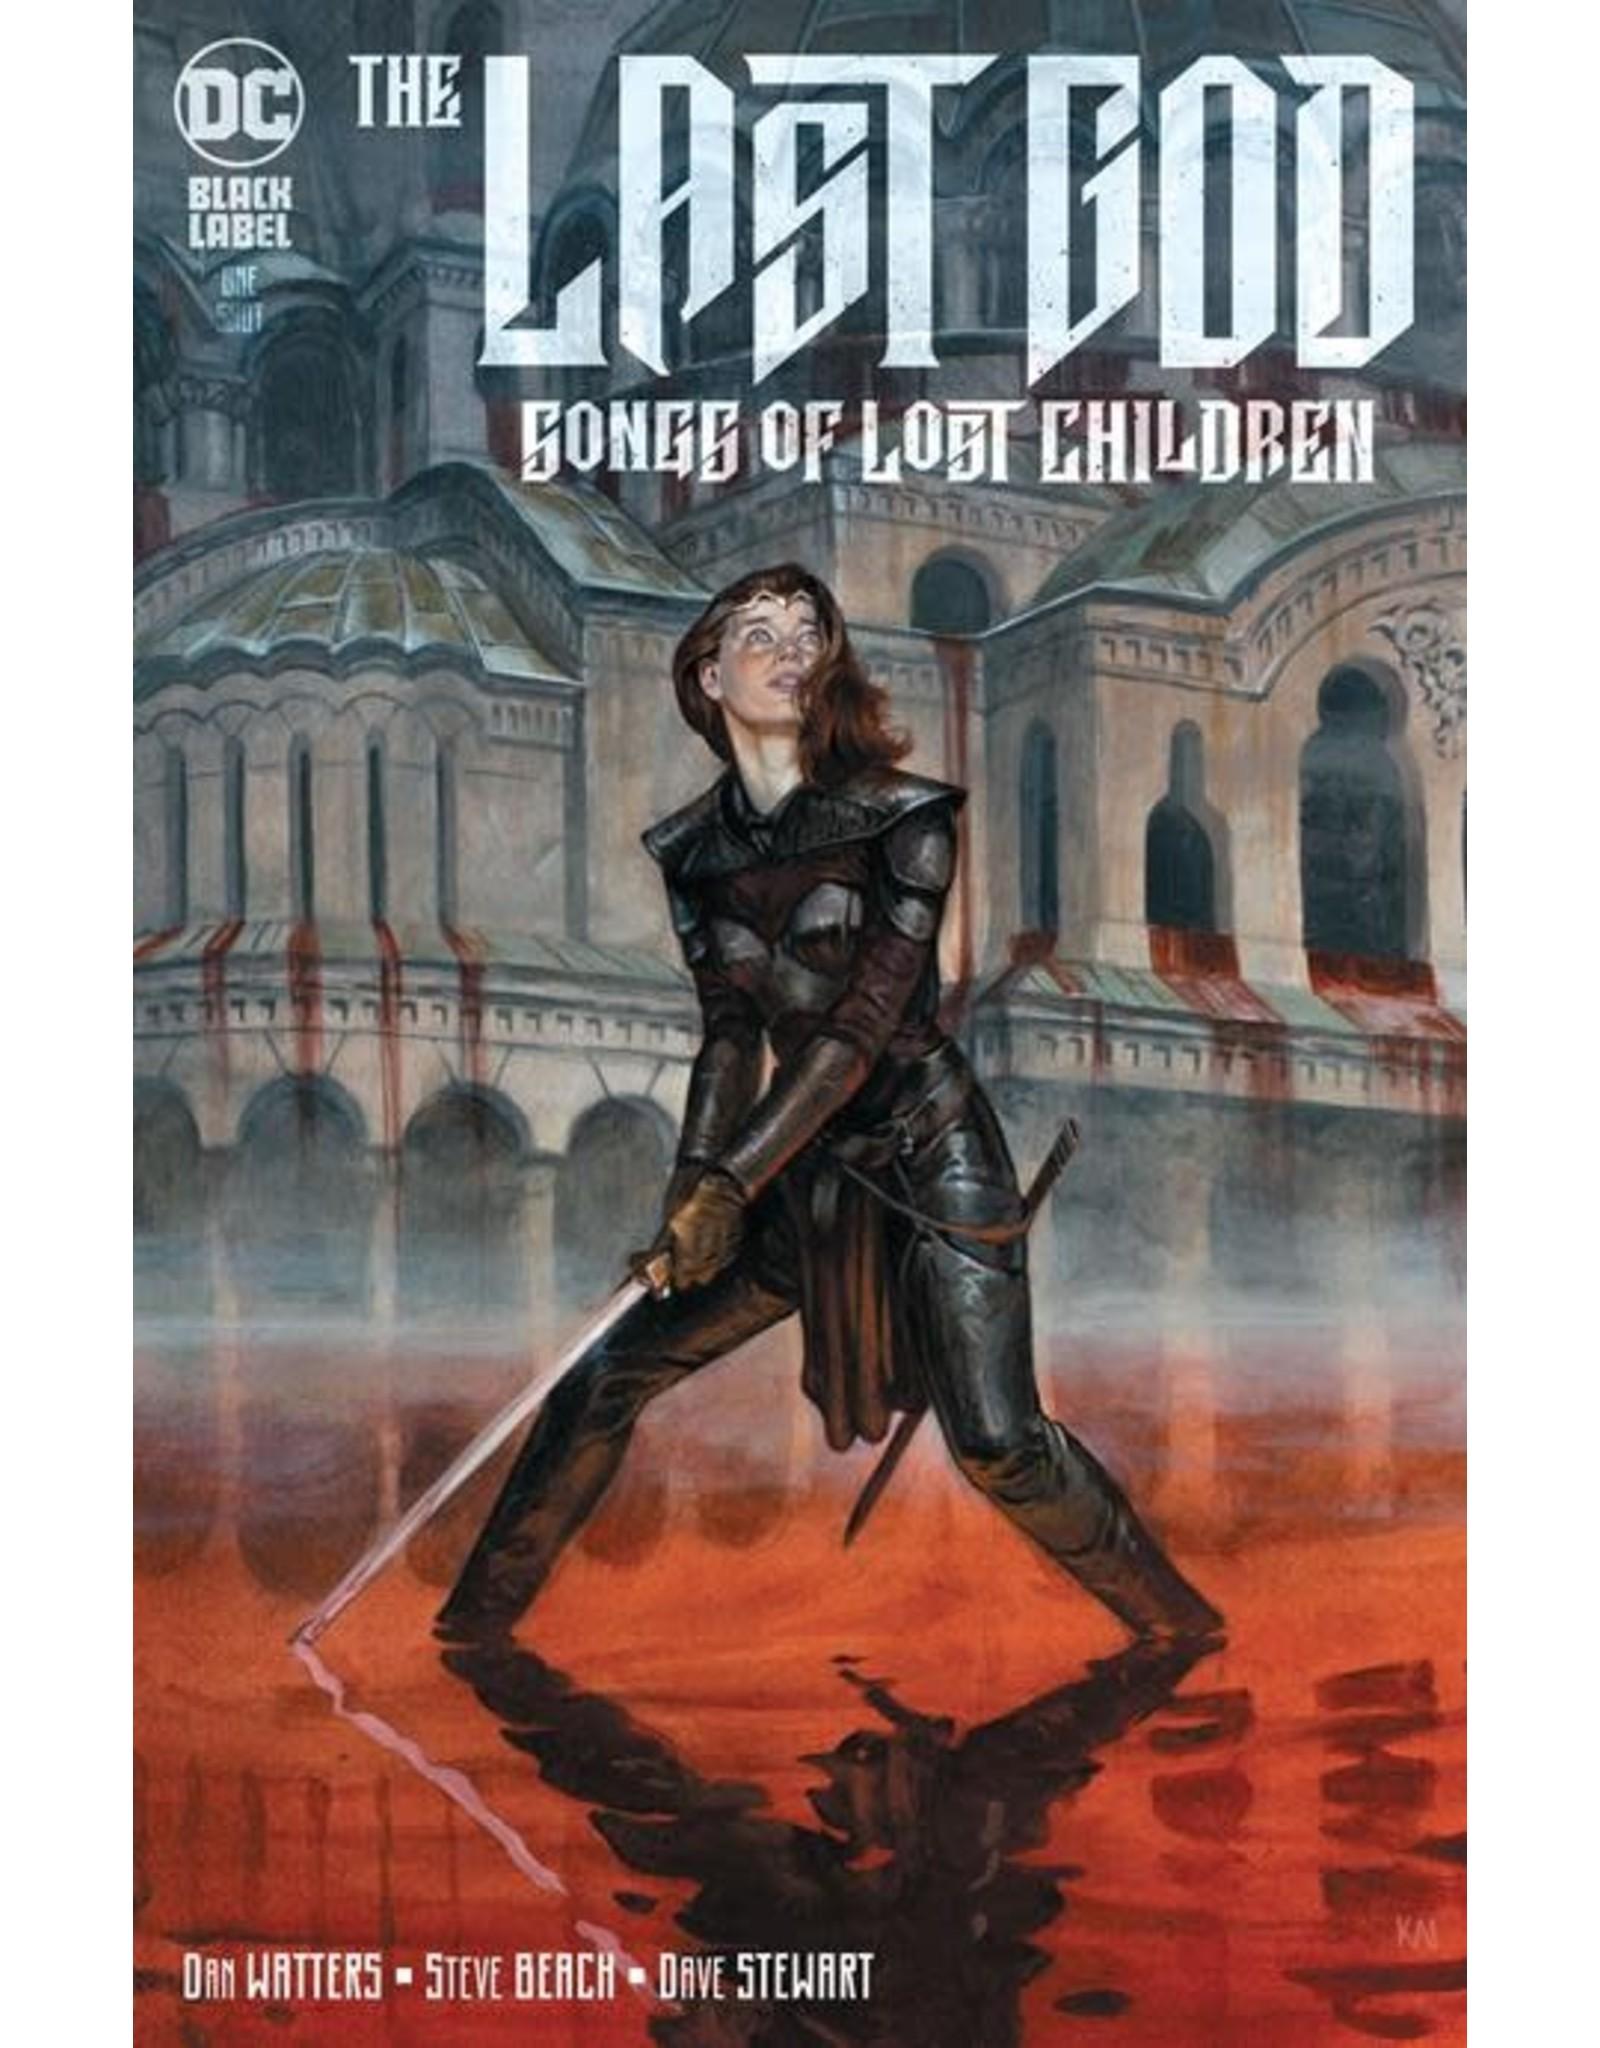 DC Comics LAST GOD SONGS OF LOST CHILDREN #1 (ONE SHOT) (MR)